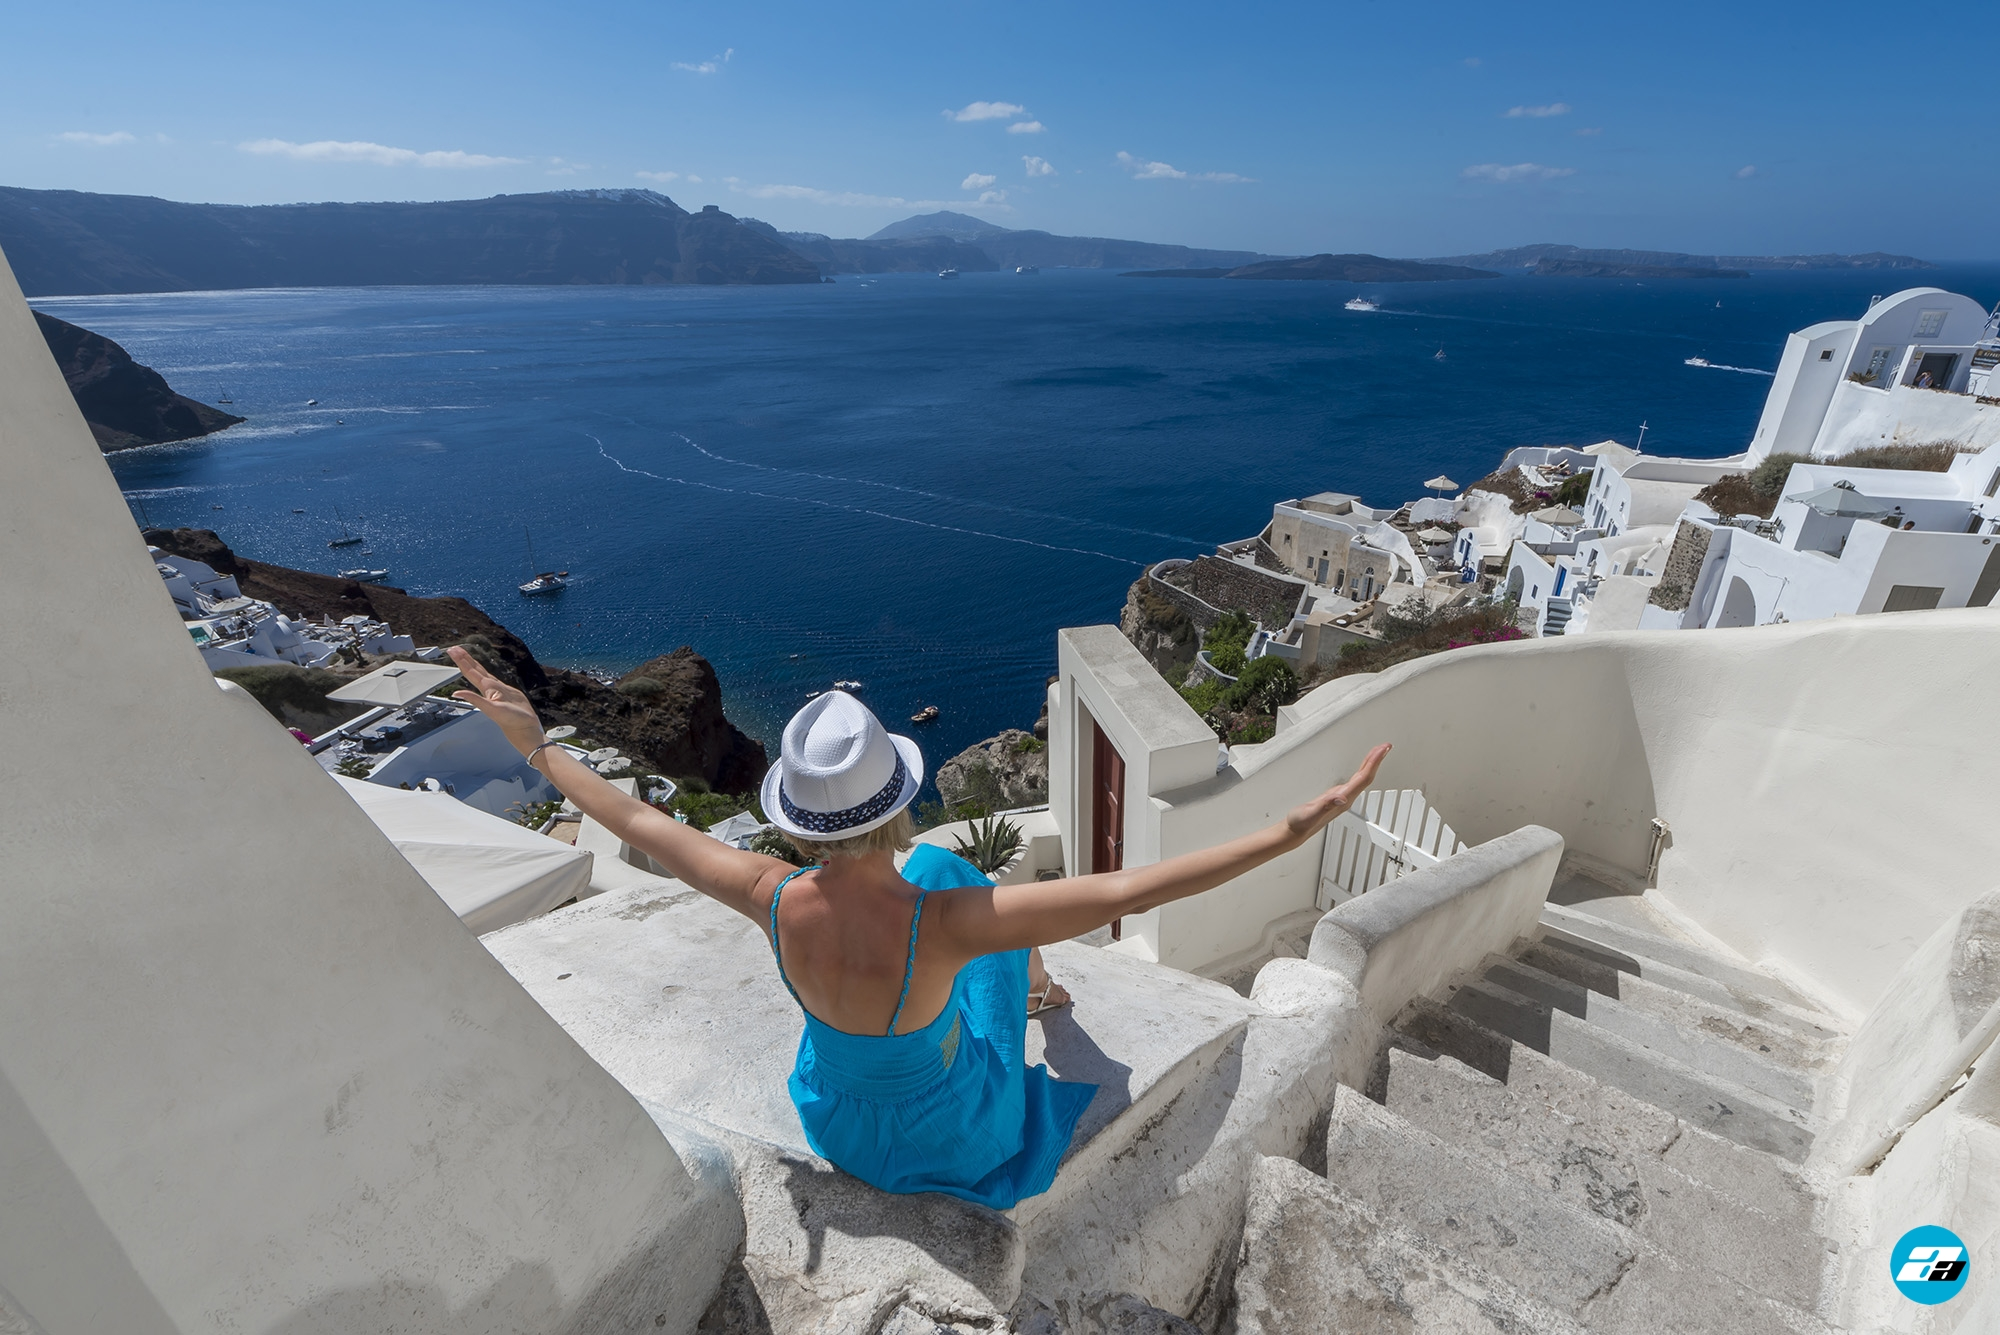 Oia Santorini Greece. Oia stairways. Fashion model. Blue dress.